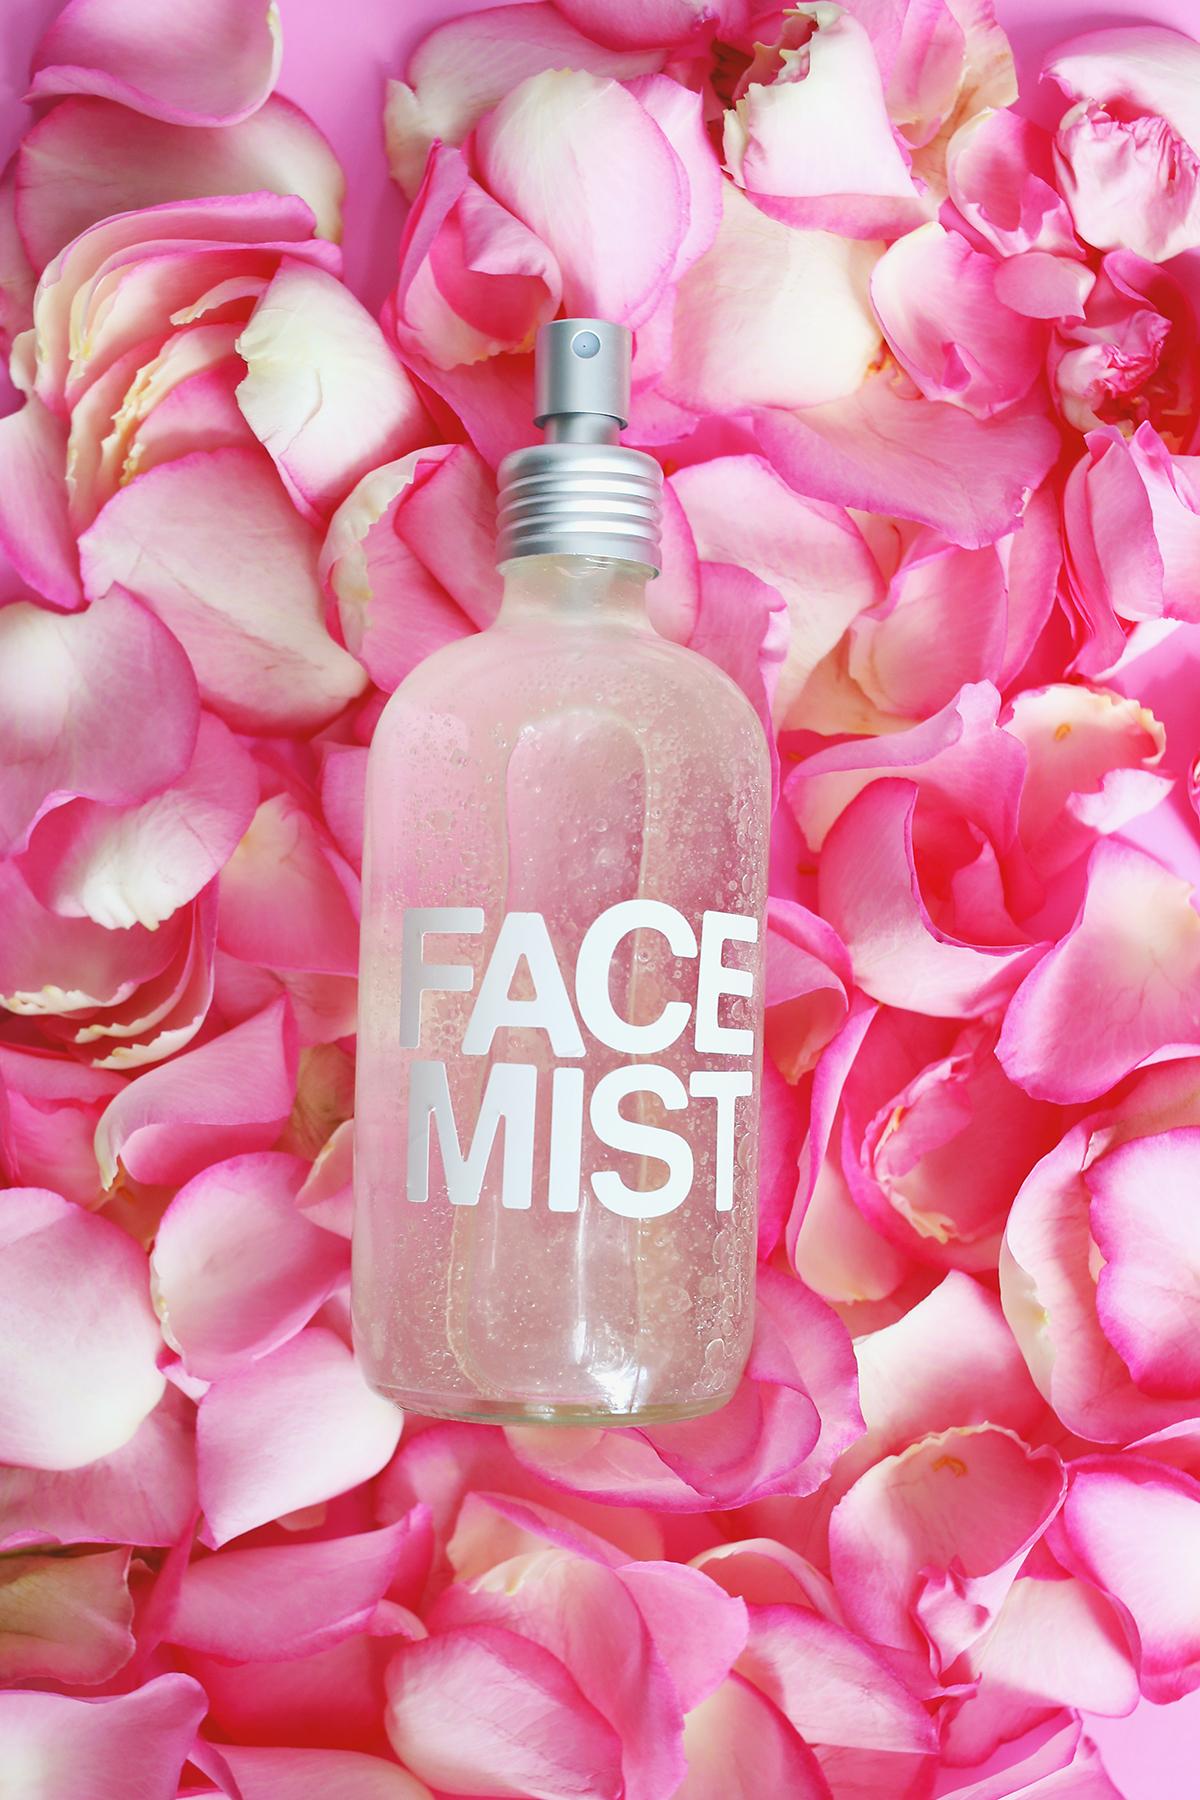 Rose water face mist DIY